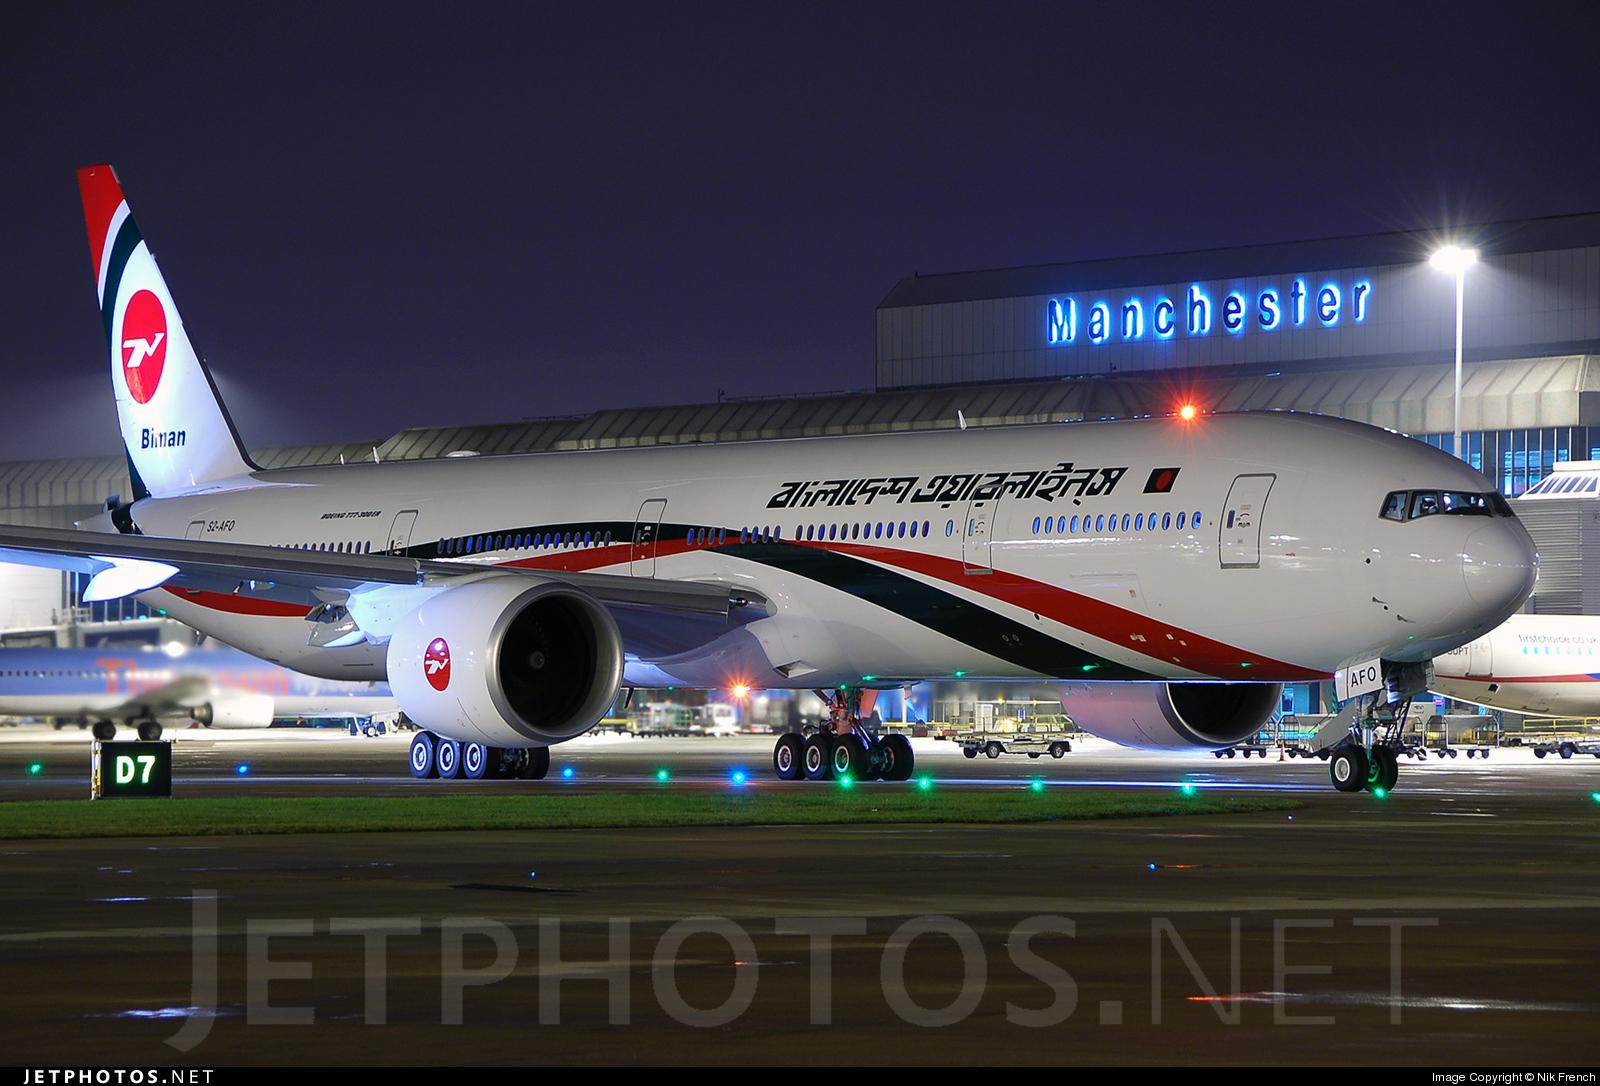 S2-AFO | Boeing 777-3E9ER | Biman Bangladesh Airlines | Nik French